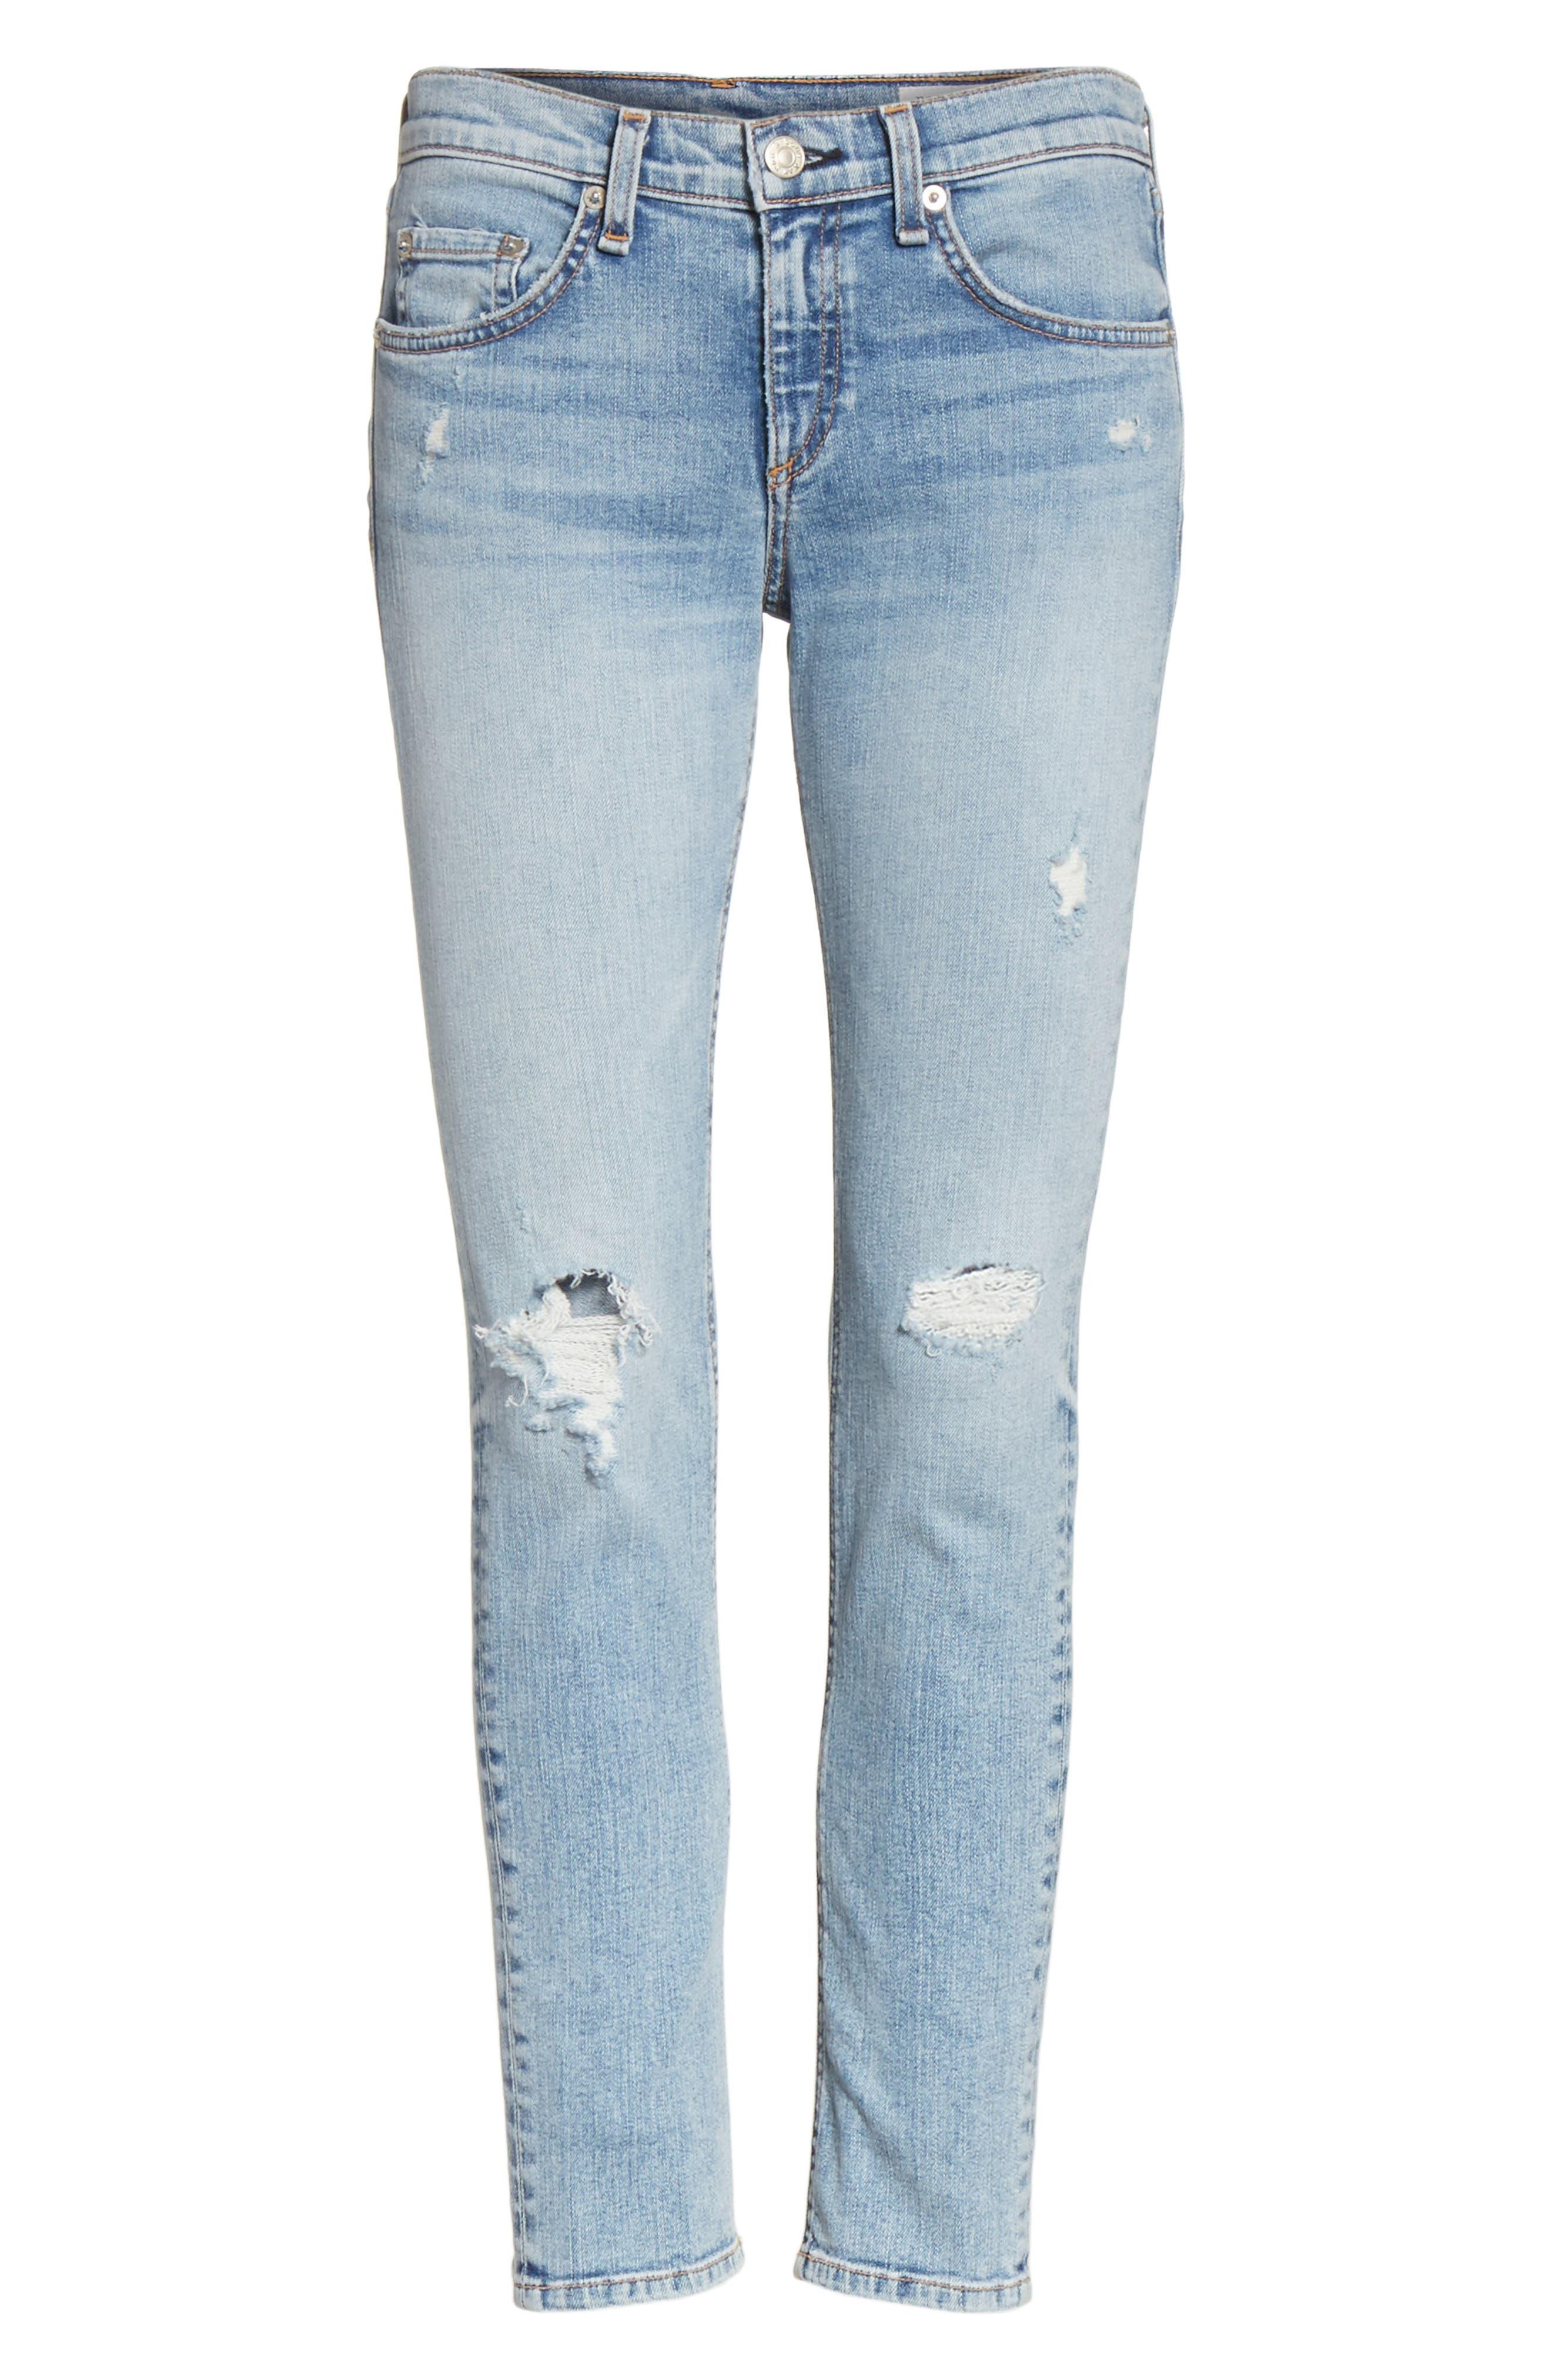 Ankle Skinny Jeans,                             Alternate thumbnail 7, color,                             450